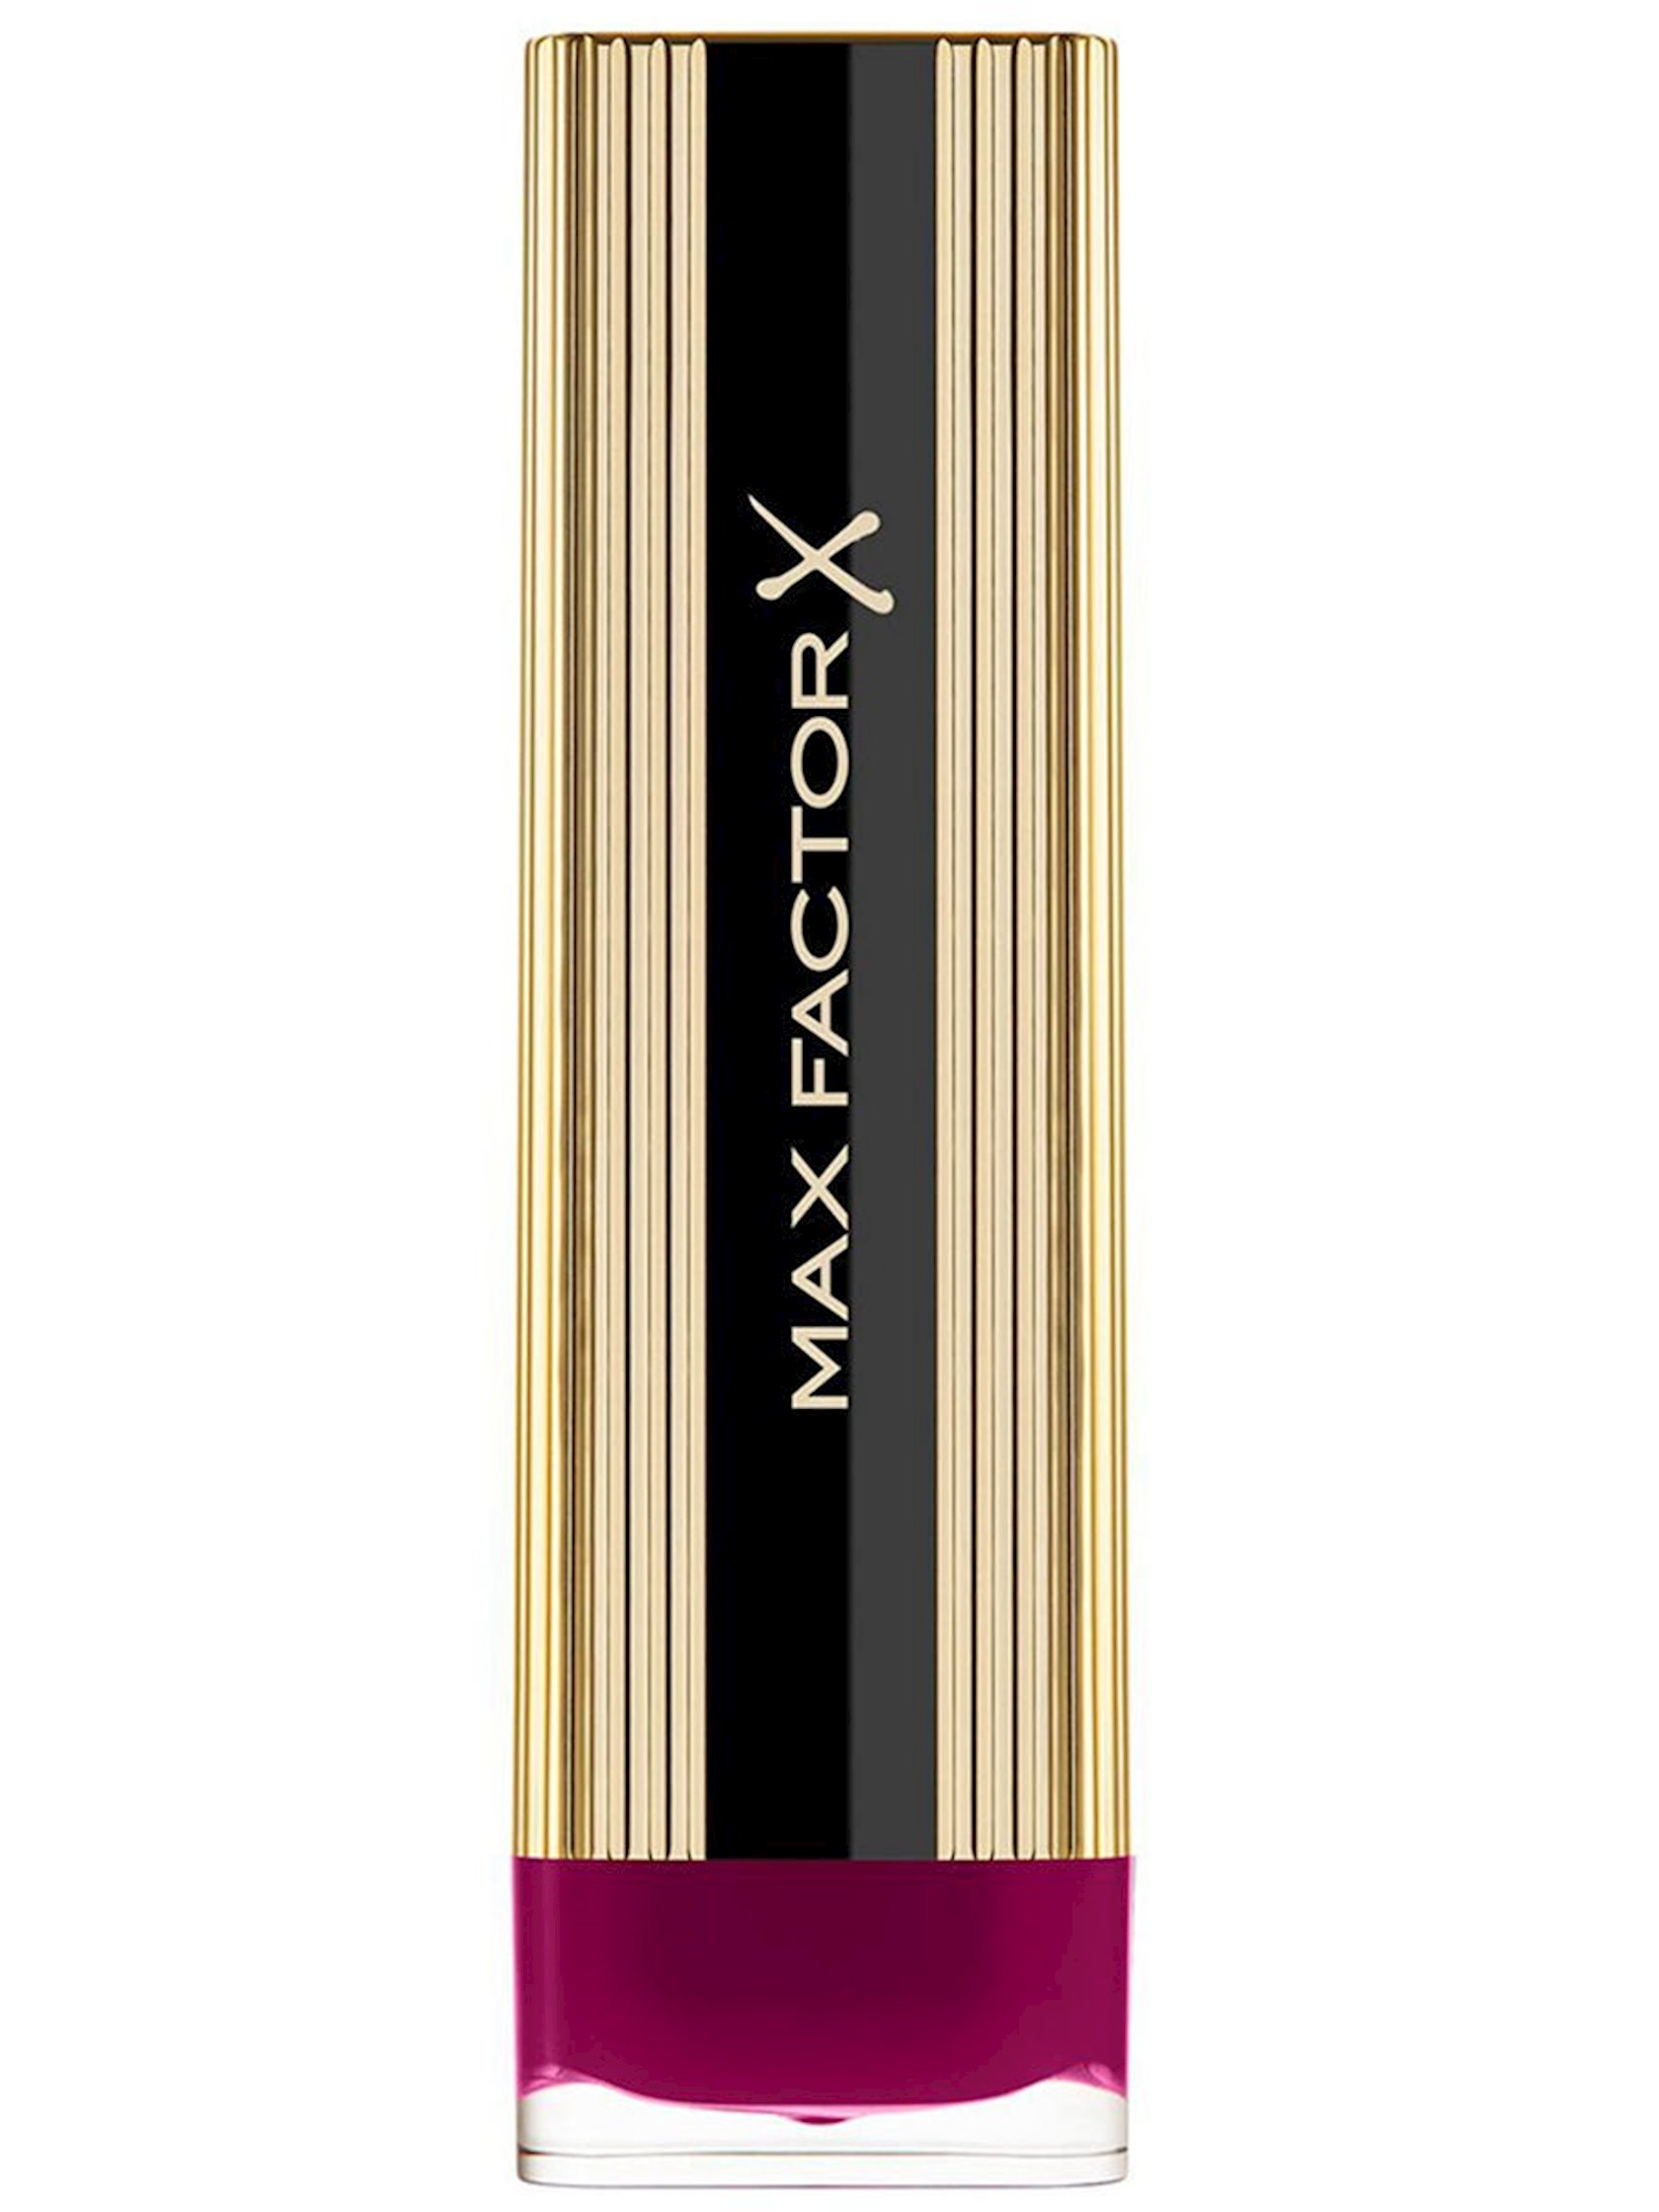 Dodaq pomadası Max Factor Colour Elixir Lipstick 135 Pure Plum 4.8 q